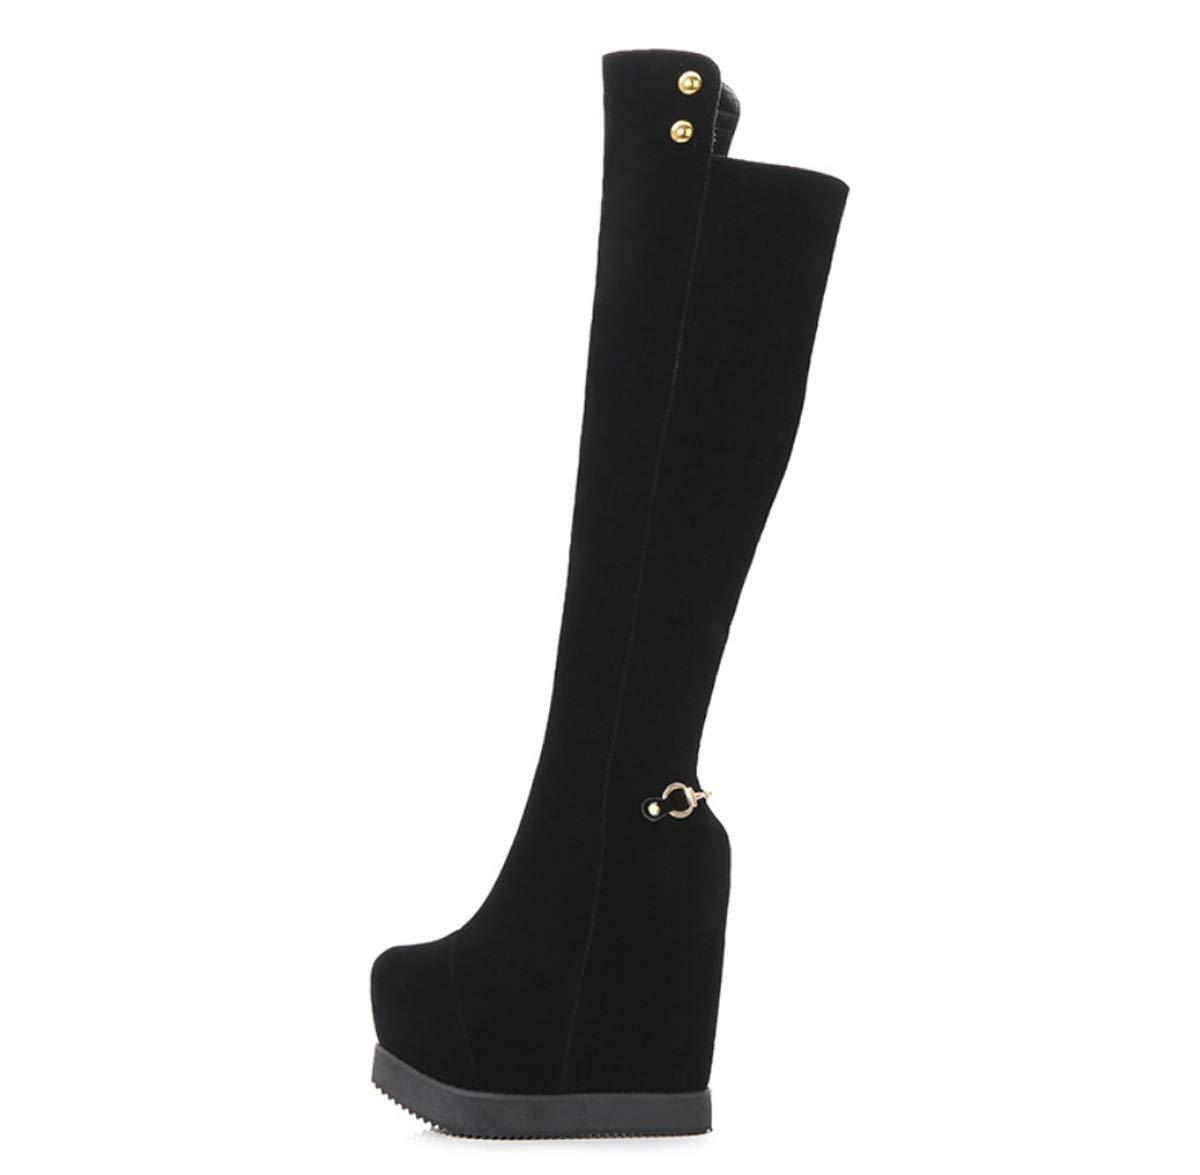 DANDANJIE Damen Stiefel Kniestiefel mit Keilabsatz Rutschfeste hohe Stiefel warme Outdoor Hidden Heels Stiefel für Herbst Winter